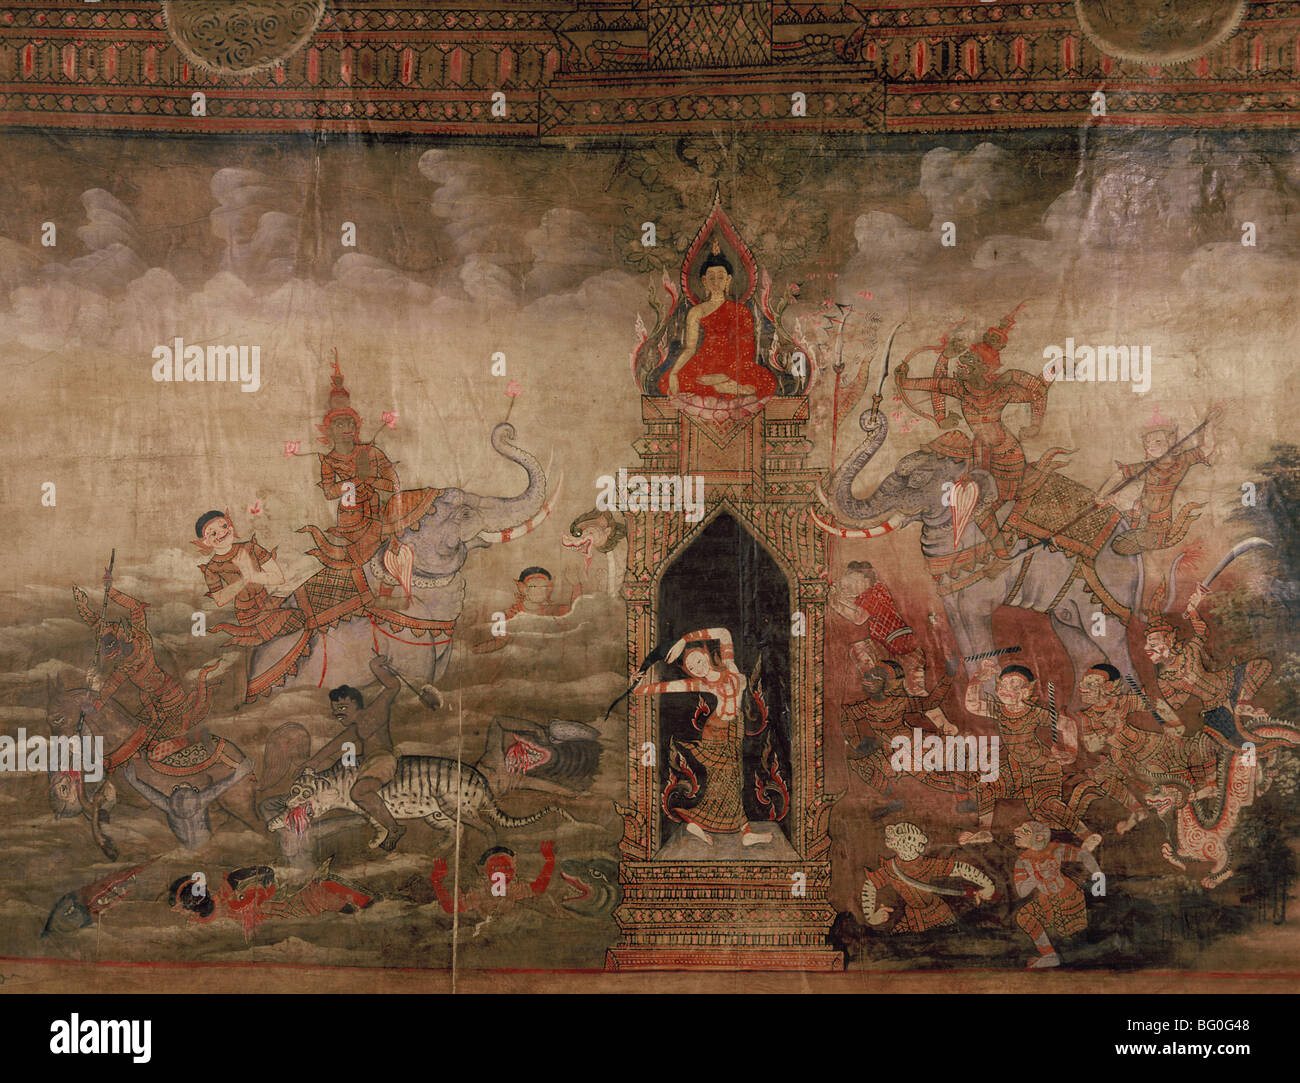 Peinture sur tissu, de Bouddha la victoire sur Mara, Thaïlande, Asie du Sud, Asie Photo Stock